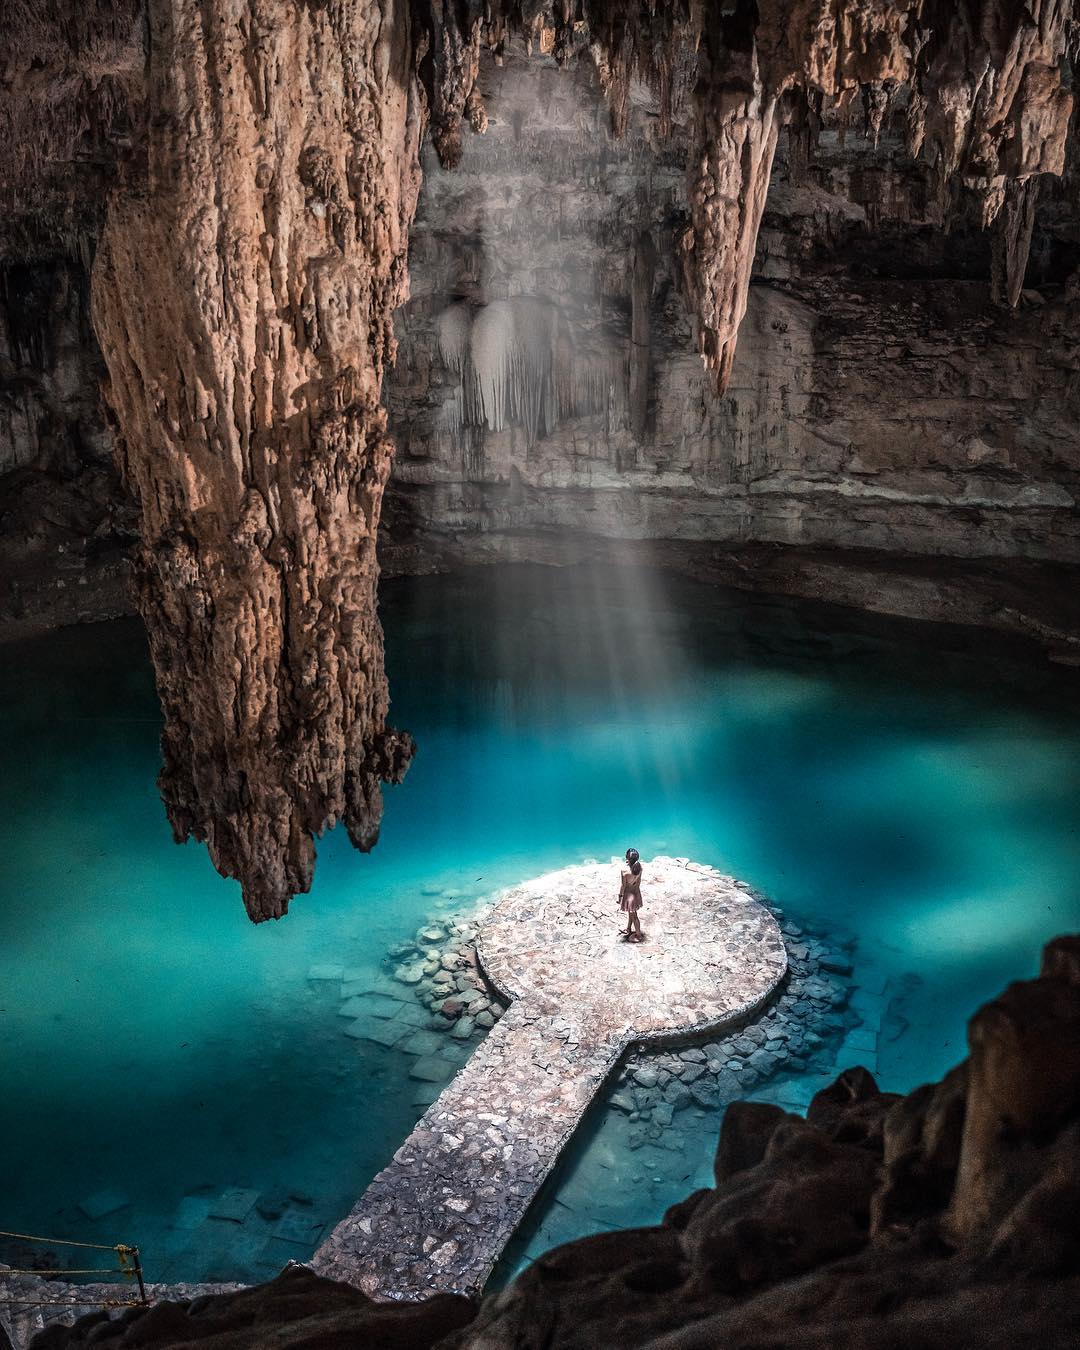 Jordi Sark water cave mountain travel calming image